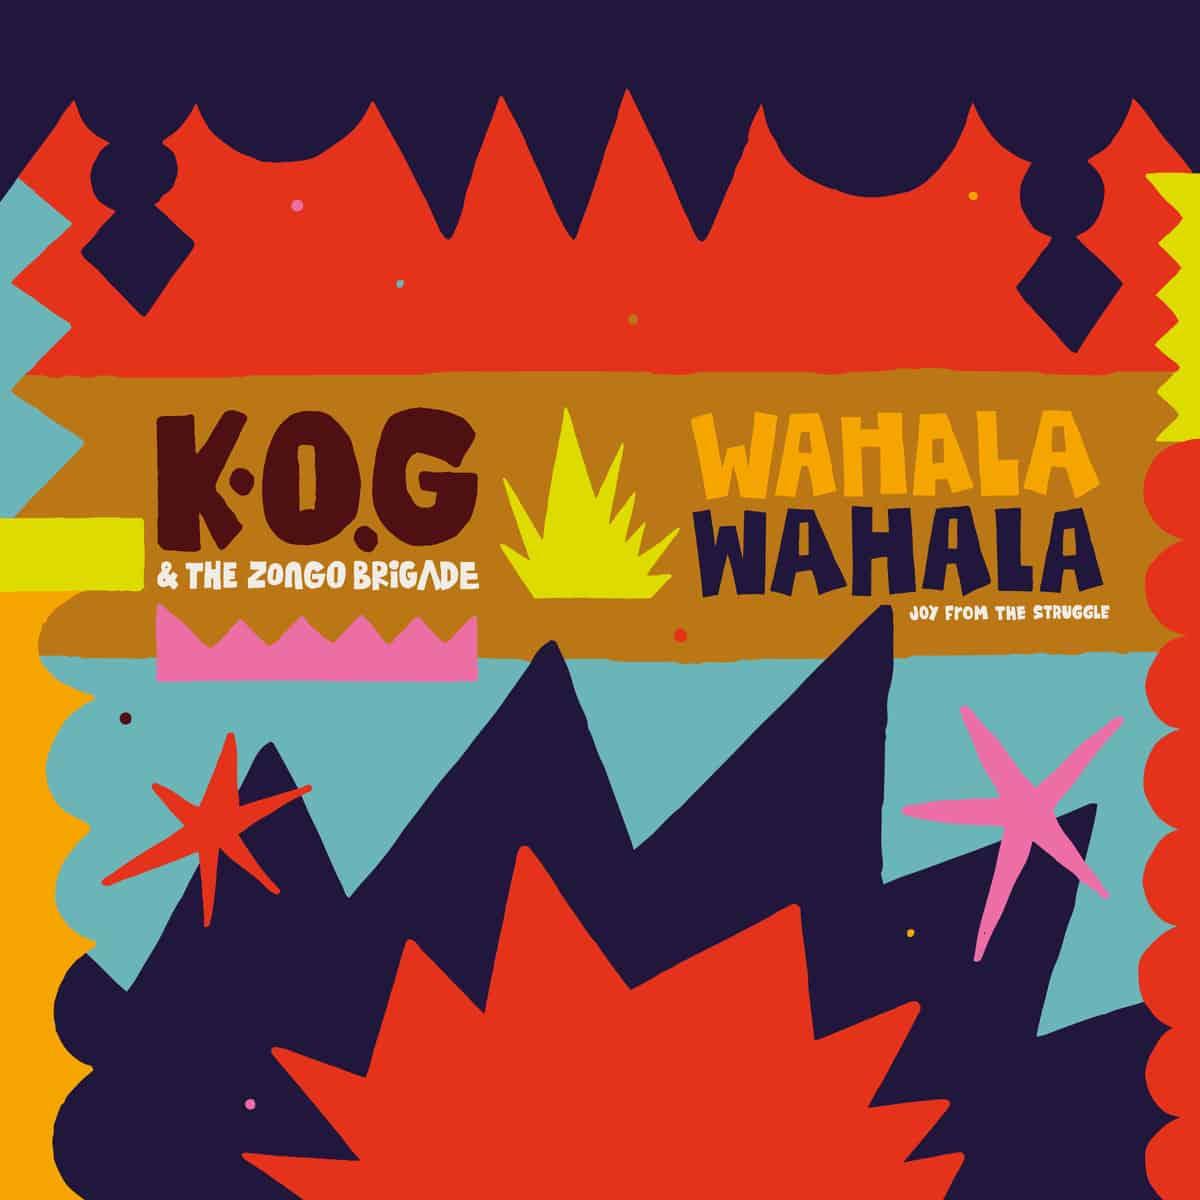 K.O.G & the Zongo Brigade - Wahala Wahala • EPK + 2 Videos + full Album stream